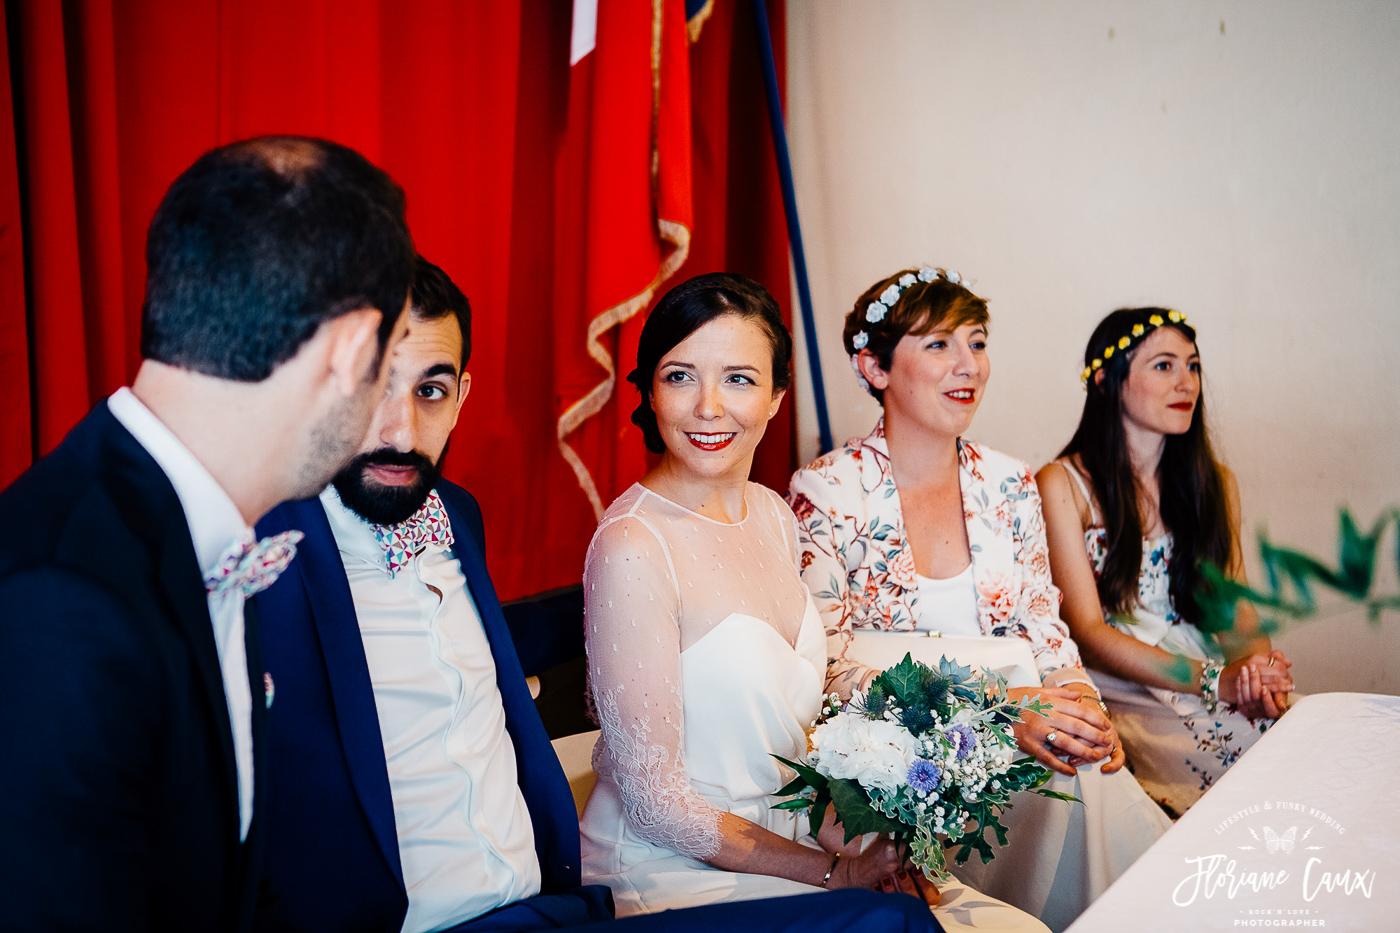 photographe-mariage-pays-basque-Floriane-Caux (15)